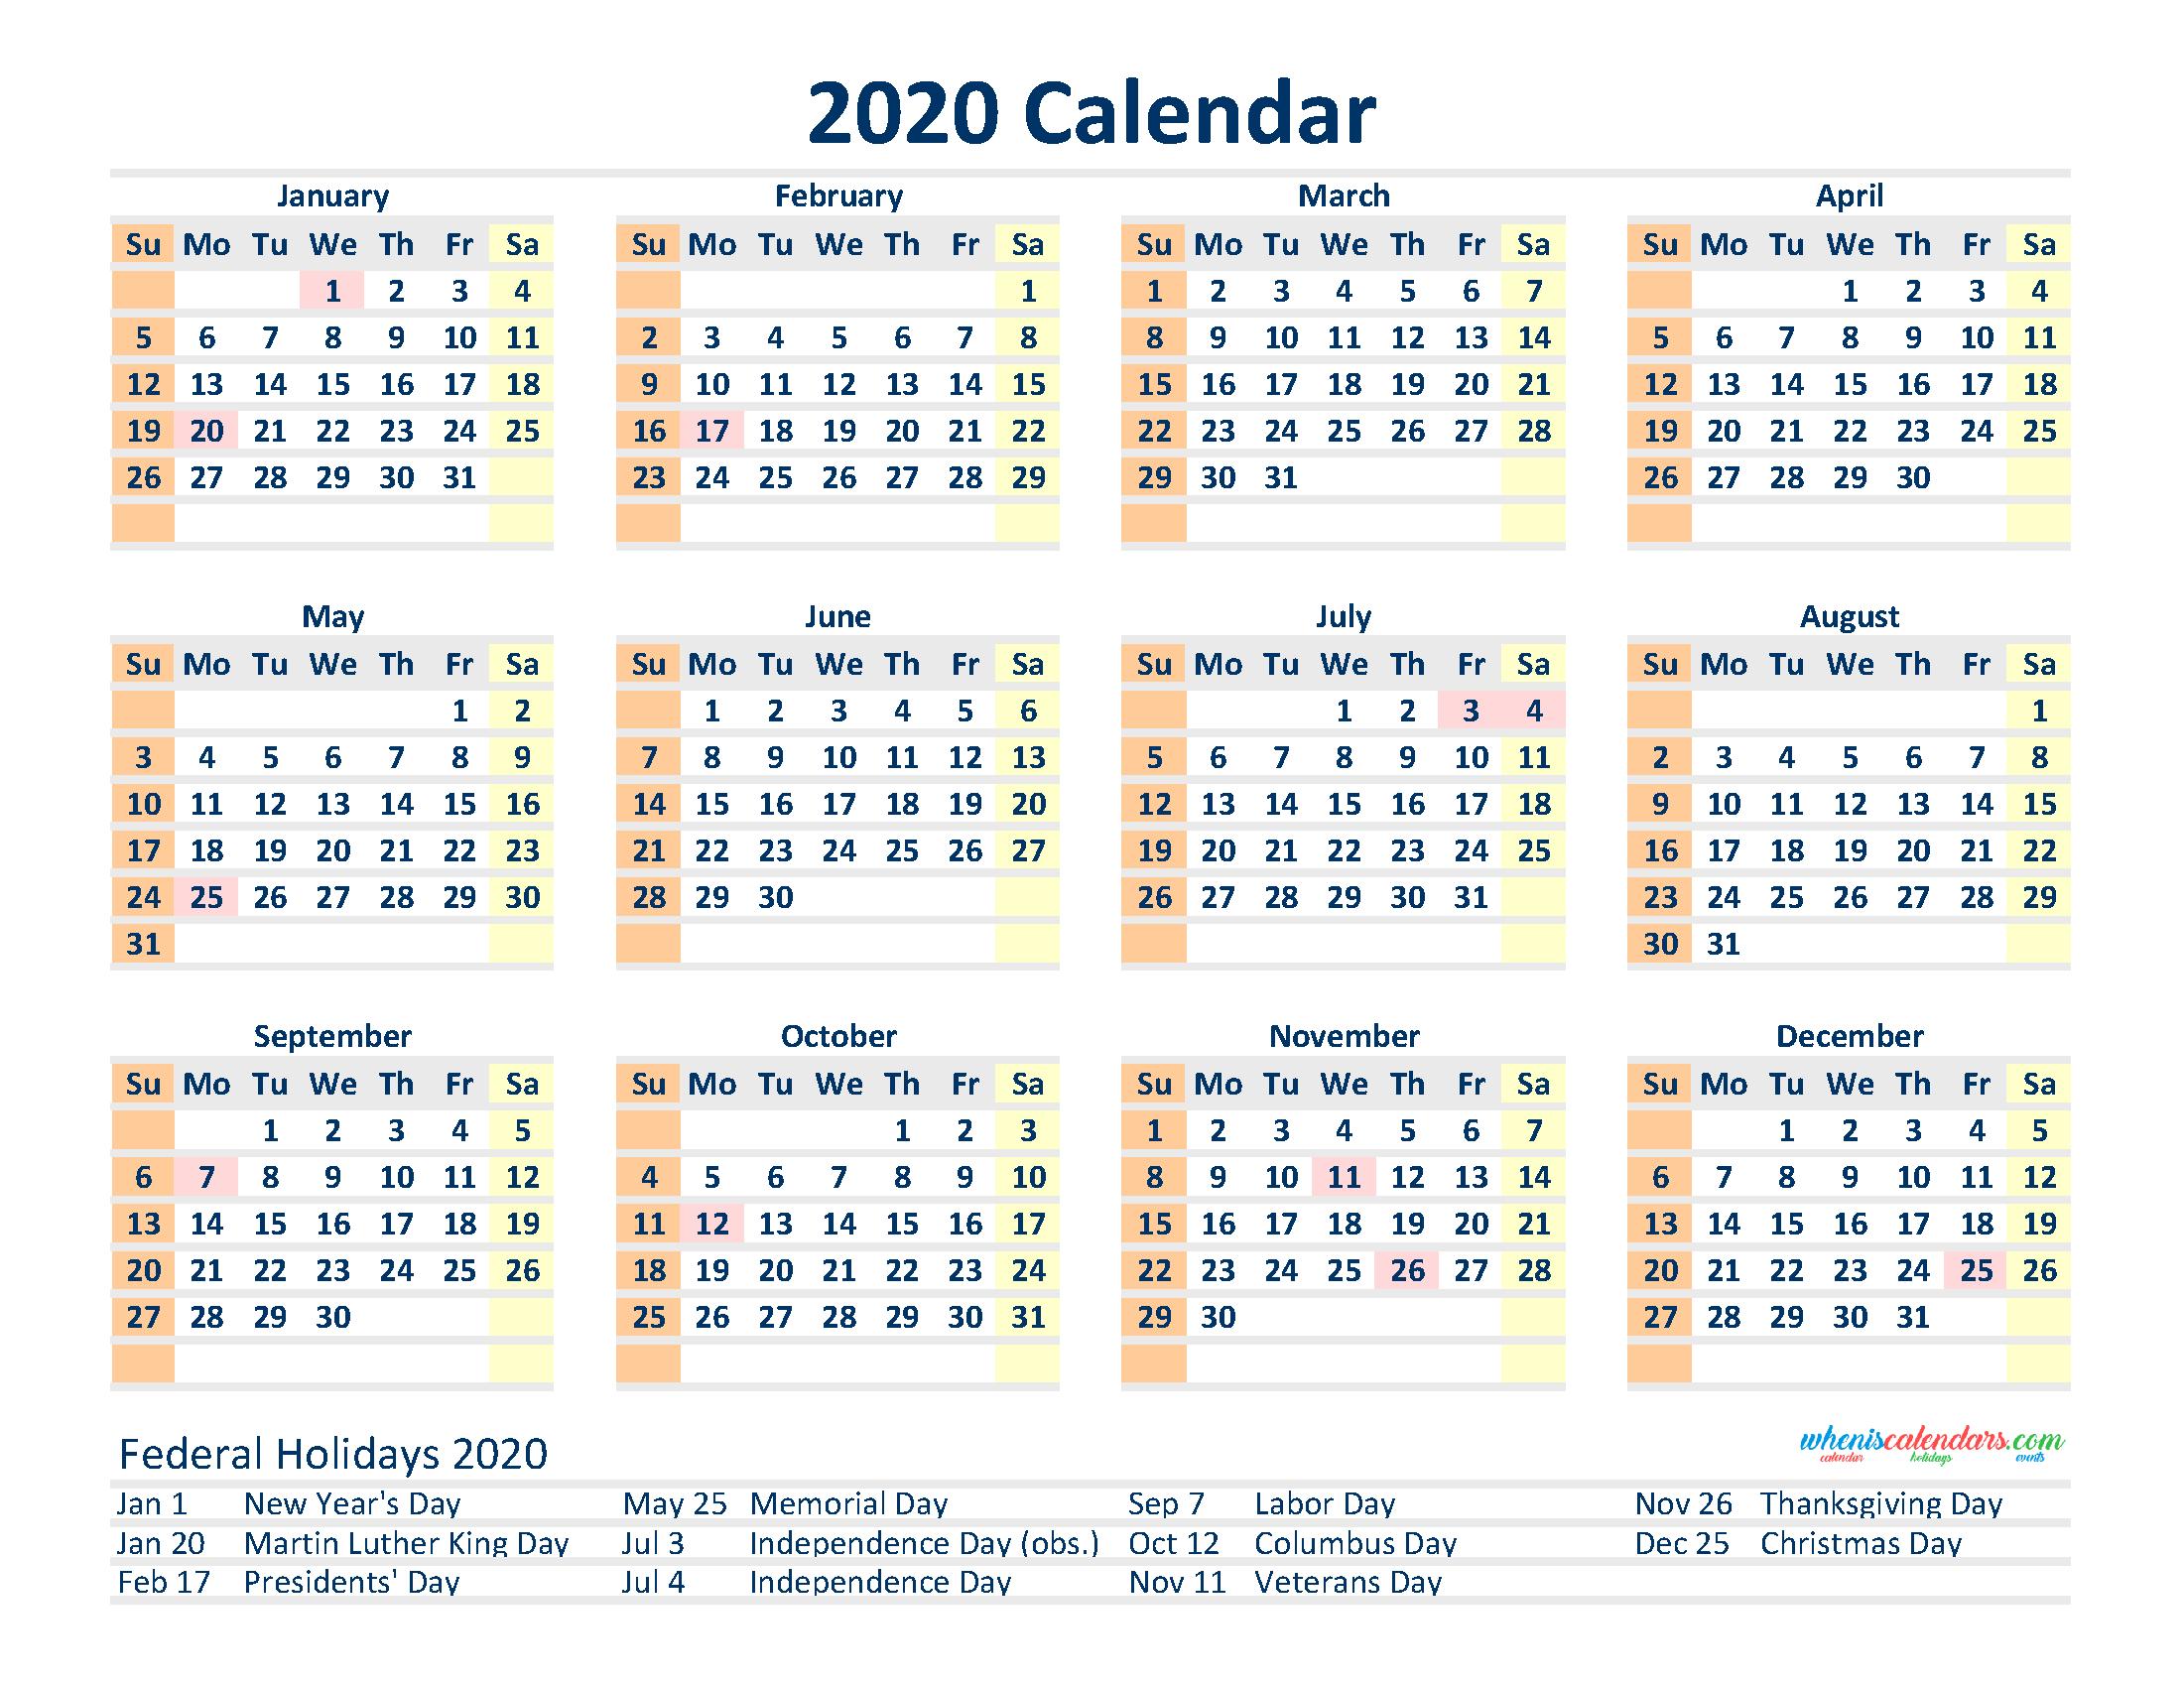 Free 2020 12 Month Calendar Printable Pdf, Excel, Image